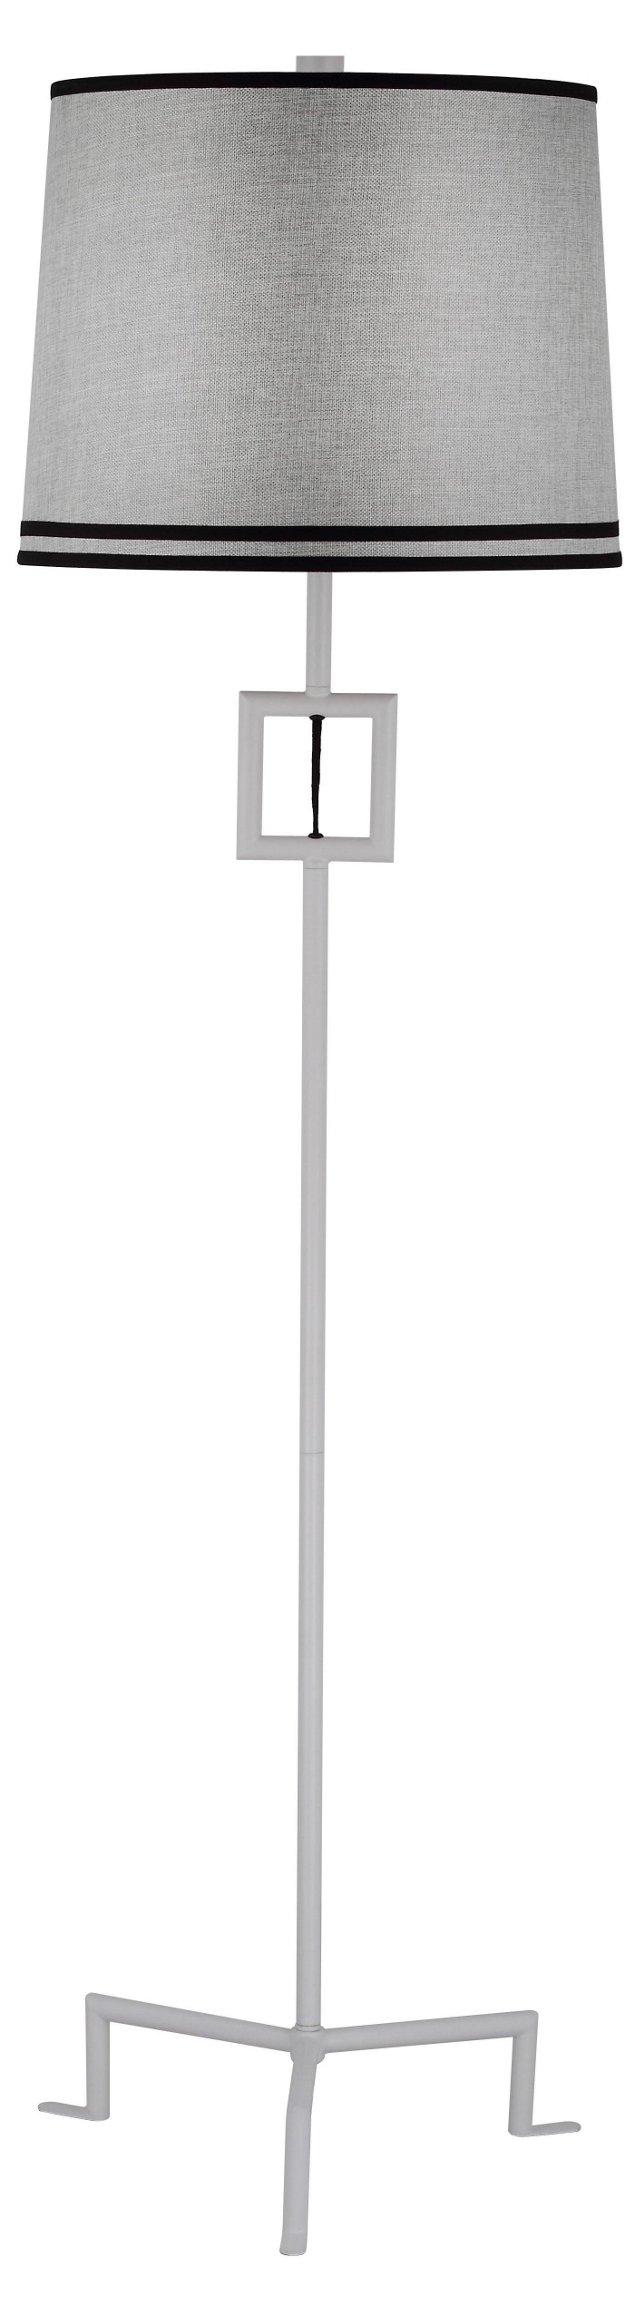 Hanover Floor Lamp, Gray Linen